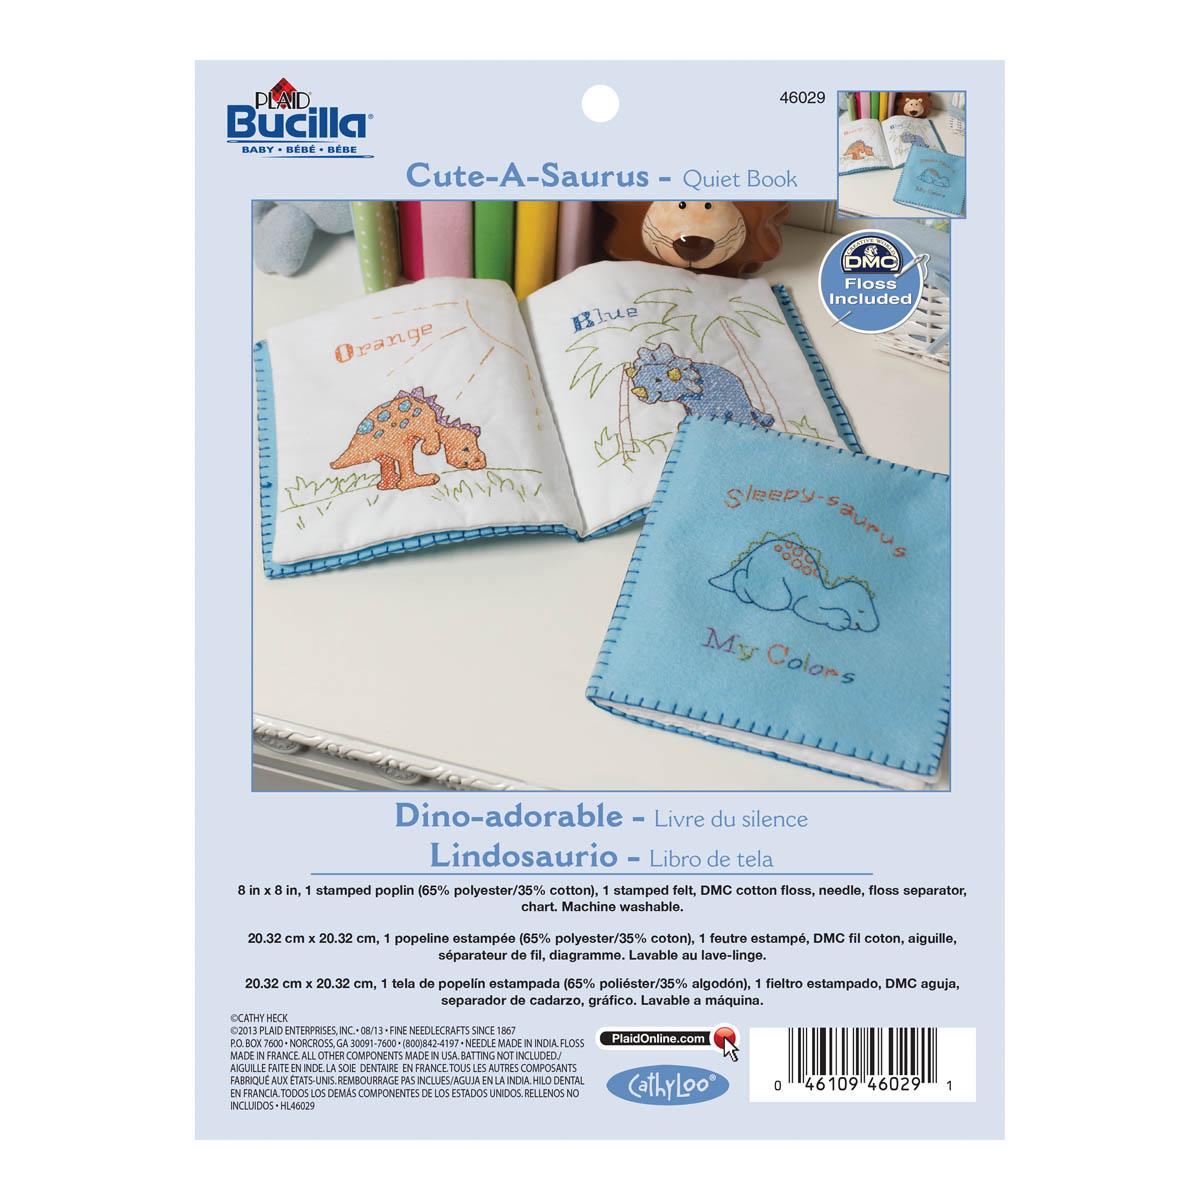 Bucilla ® Baby - Stamped Cross Stitch - Crib Ensembles - Cute-A-Saurus - Quiet Book - 46029